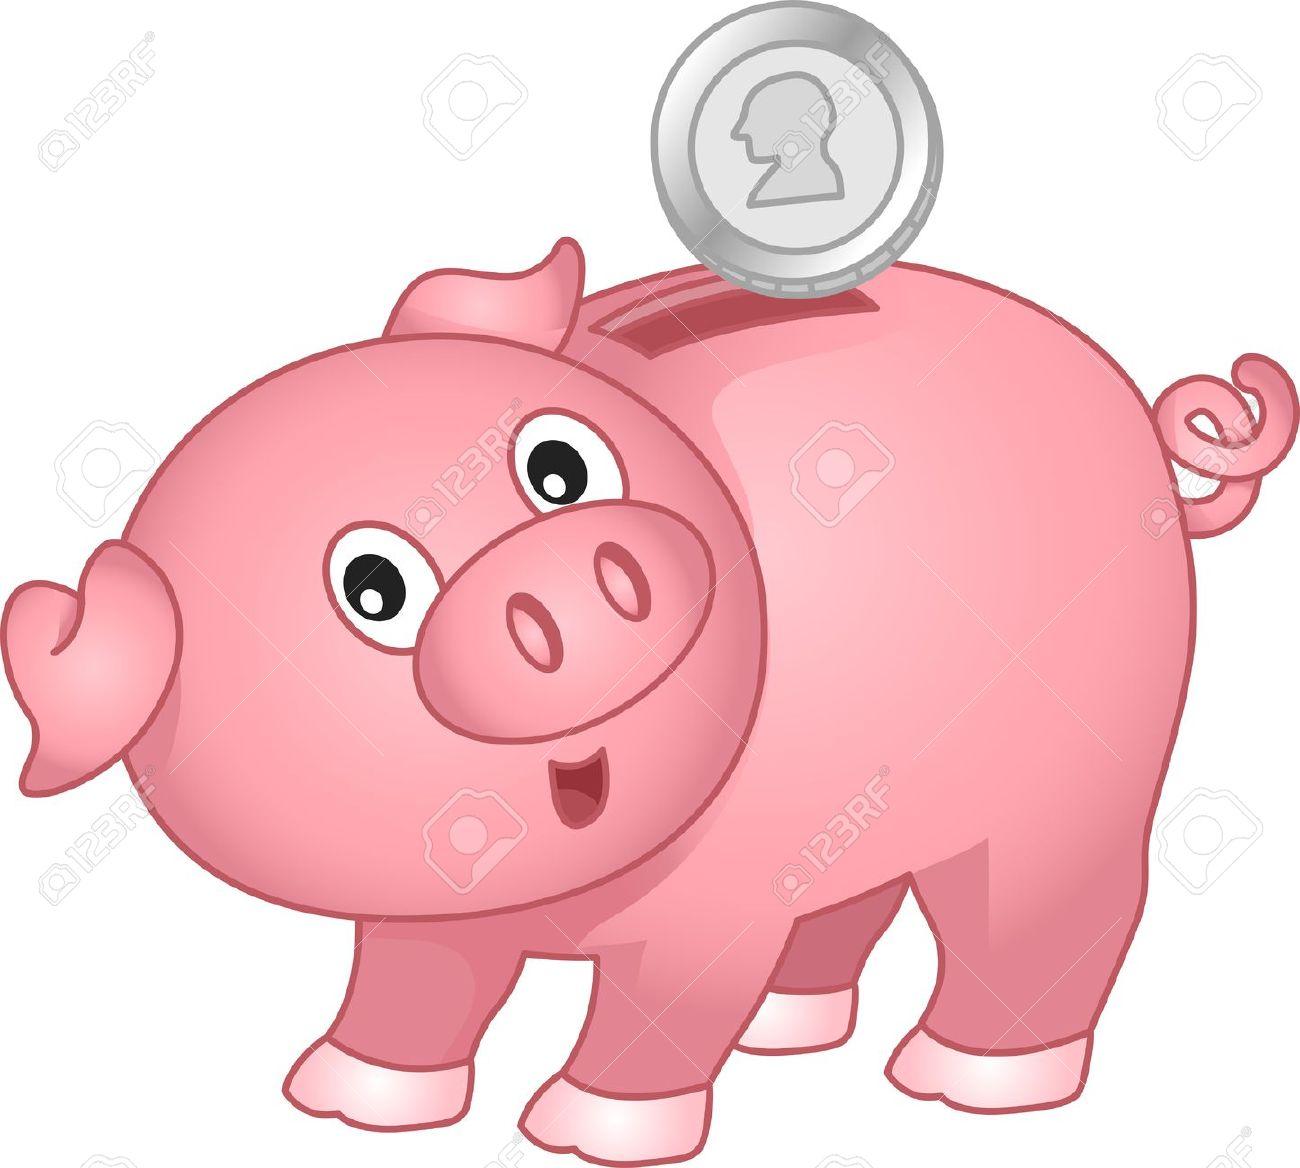 HBCU Money's 2015 Top 10 HBCU Endowments   HBCU Money